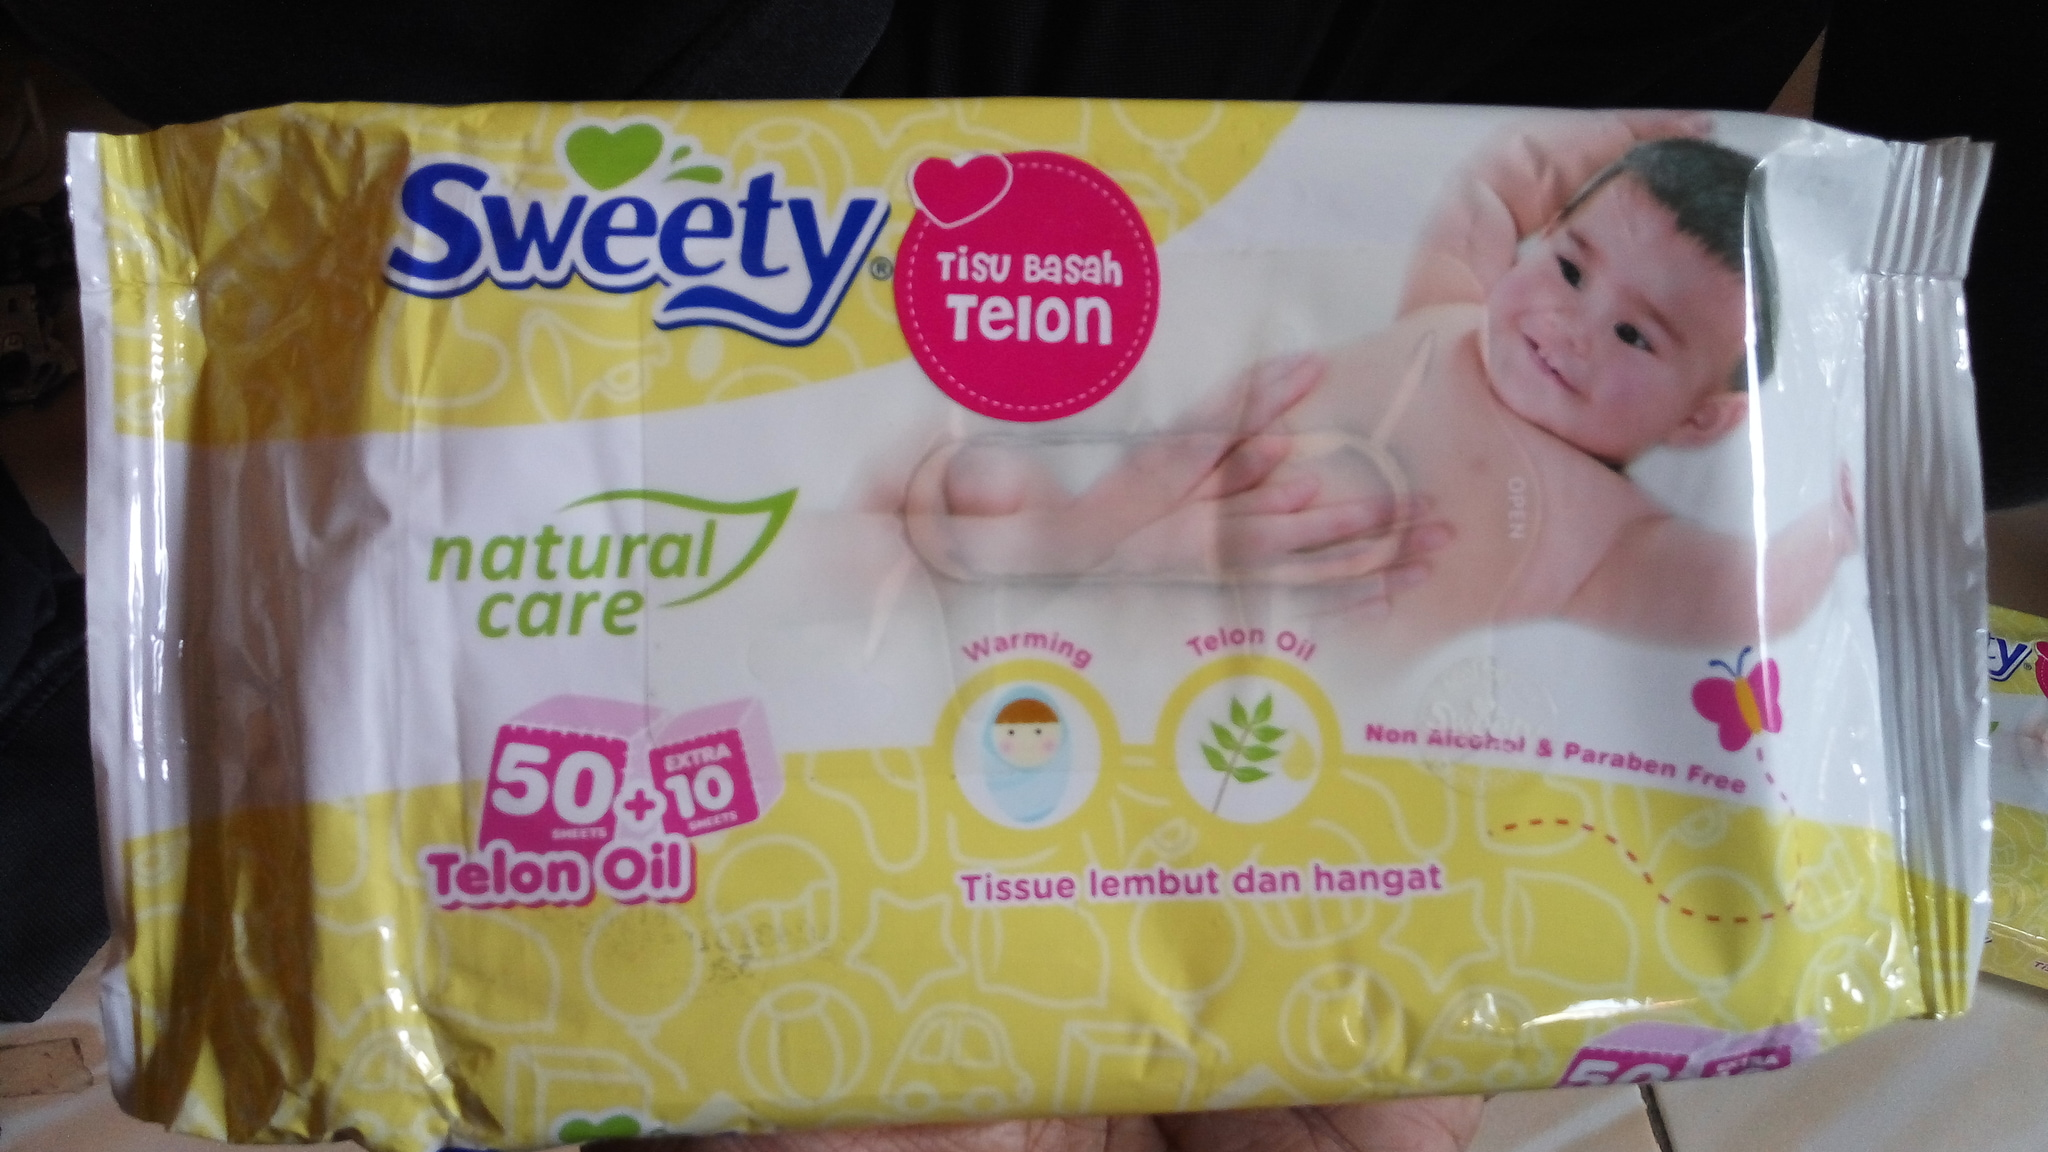 Jual Sweety Natural Care Tissue Basah Telon 60 Sheets Titikgrosirmurah Tokopedia